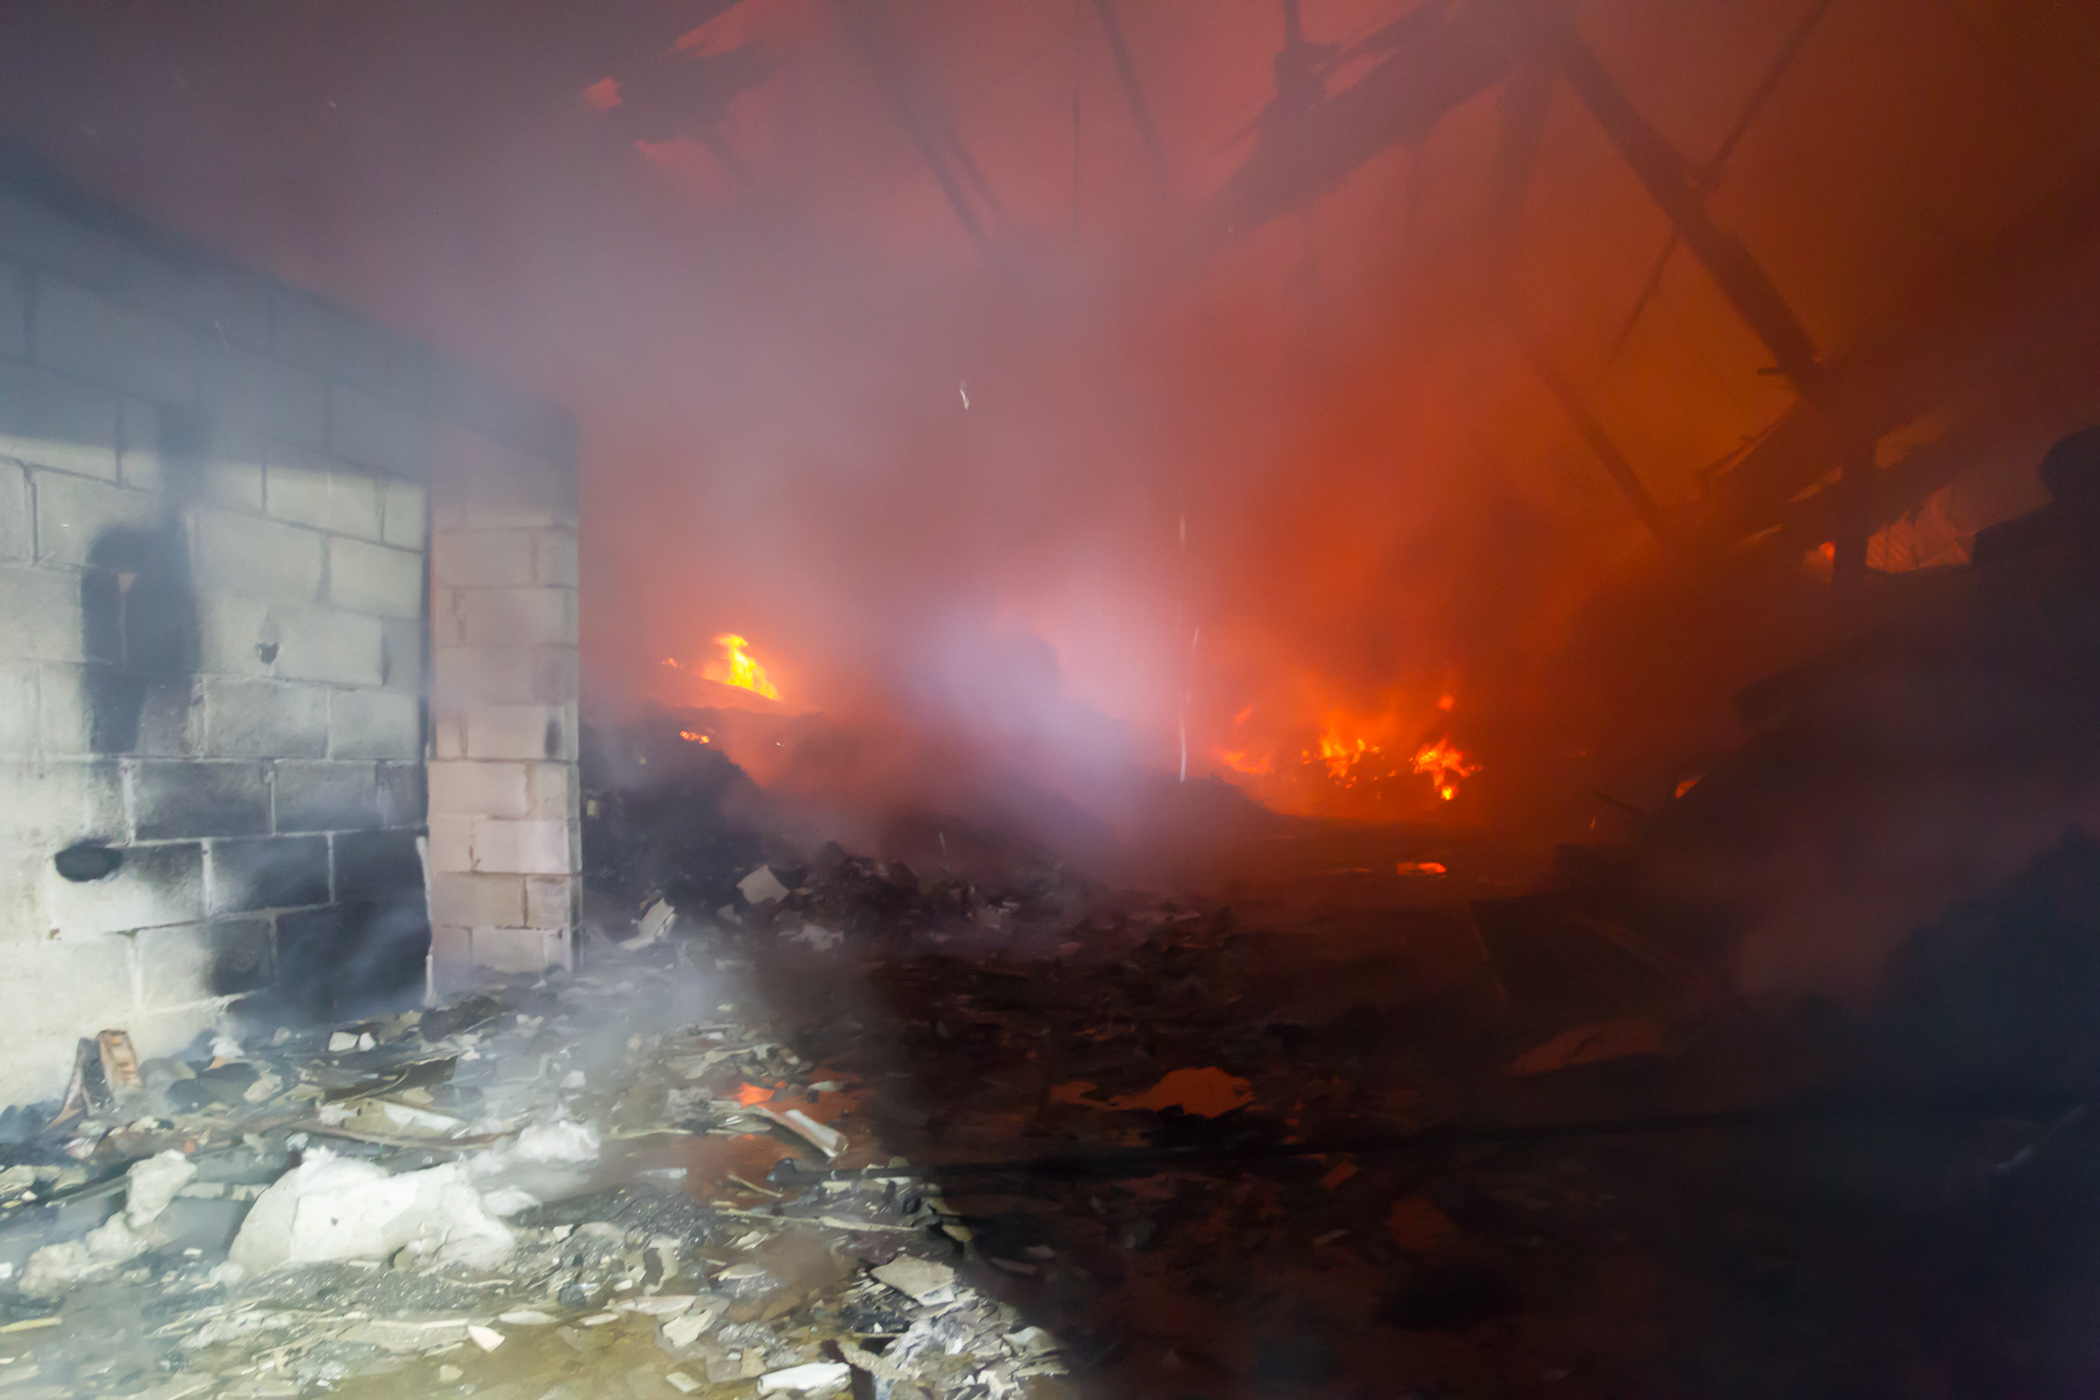 Industrial estate fire in bilston